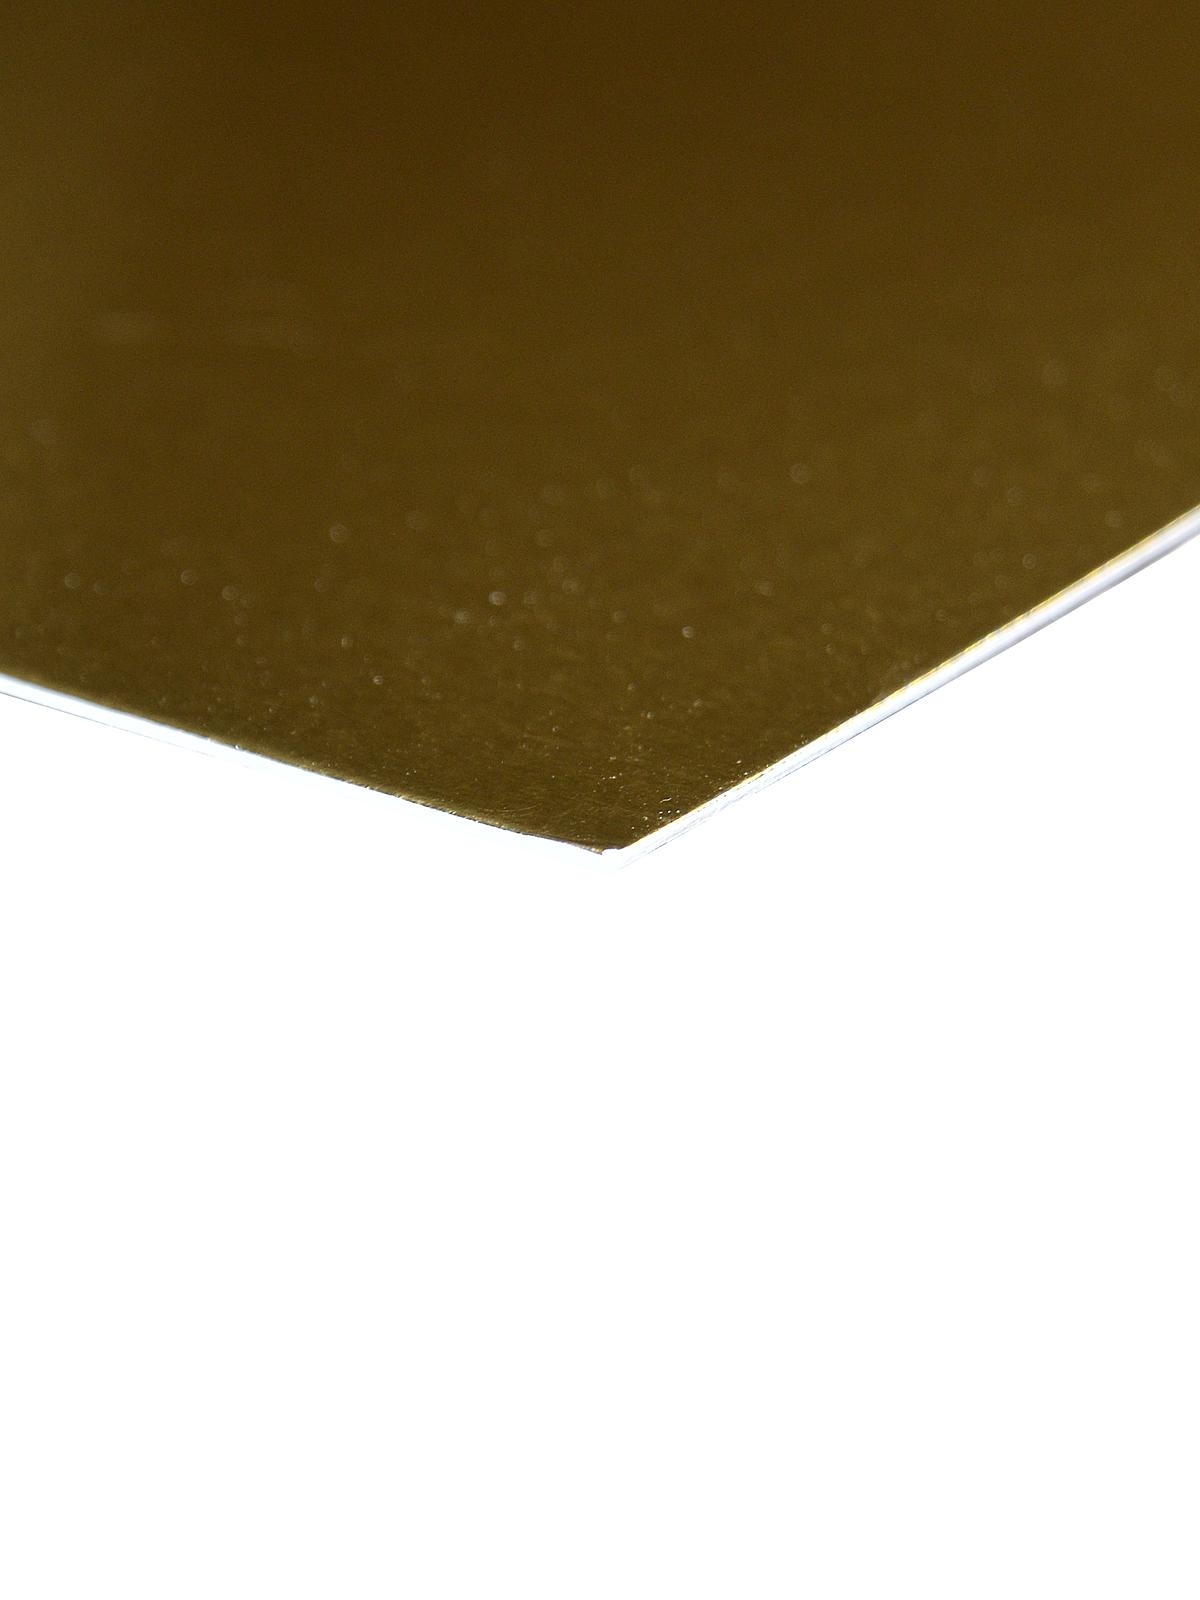 destination definitive mats mat inc to framedestination matting frame matboardguide blog board guide the